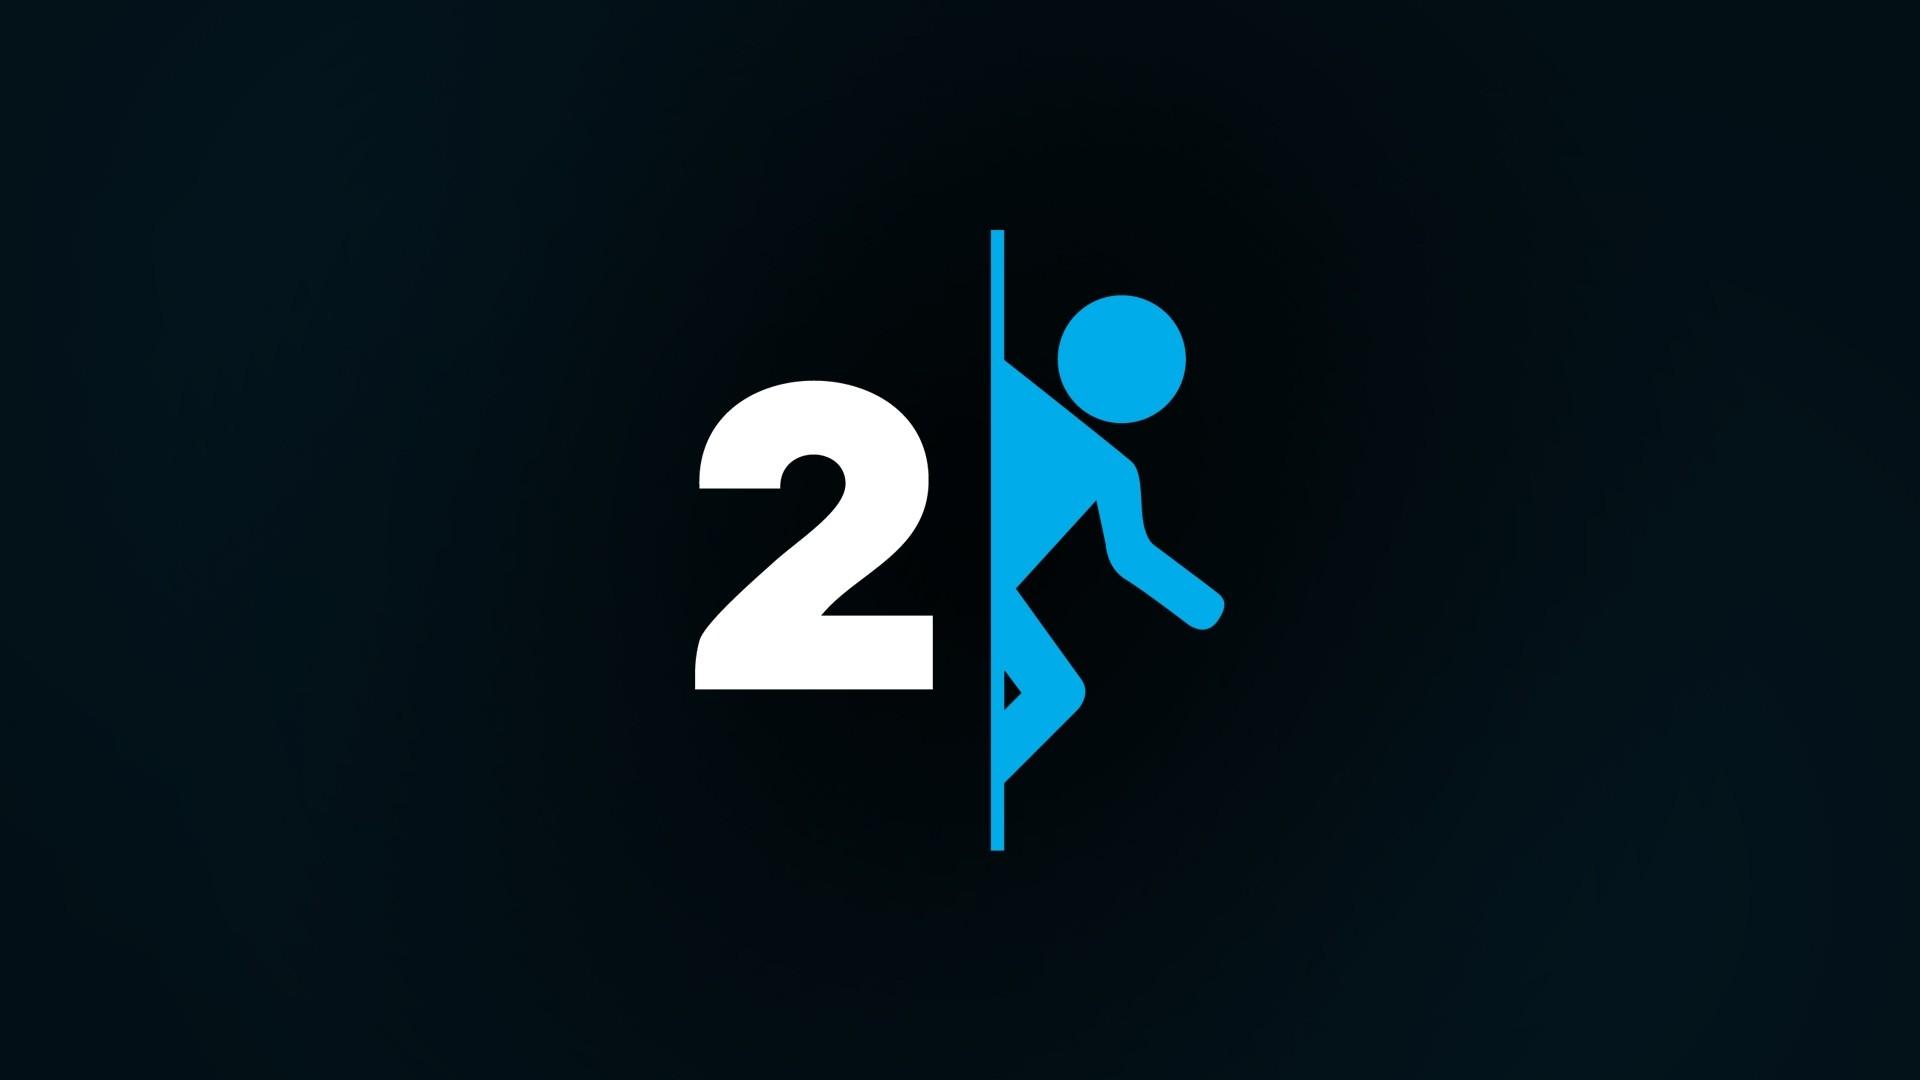 Wallpaper portal 2, logo, human, black